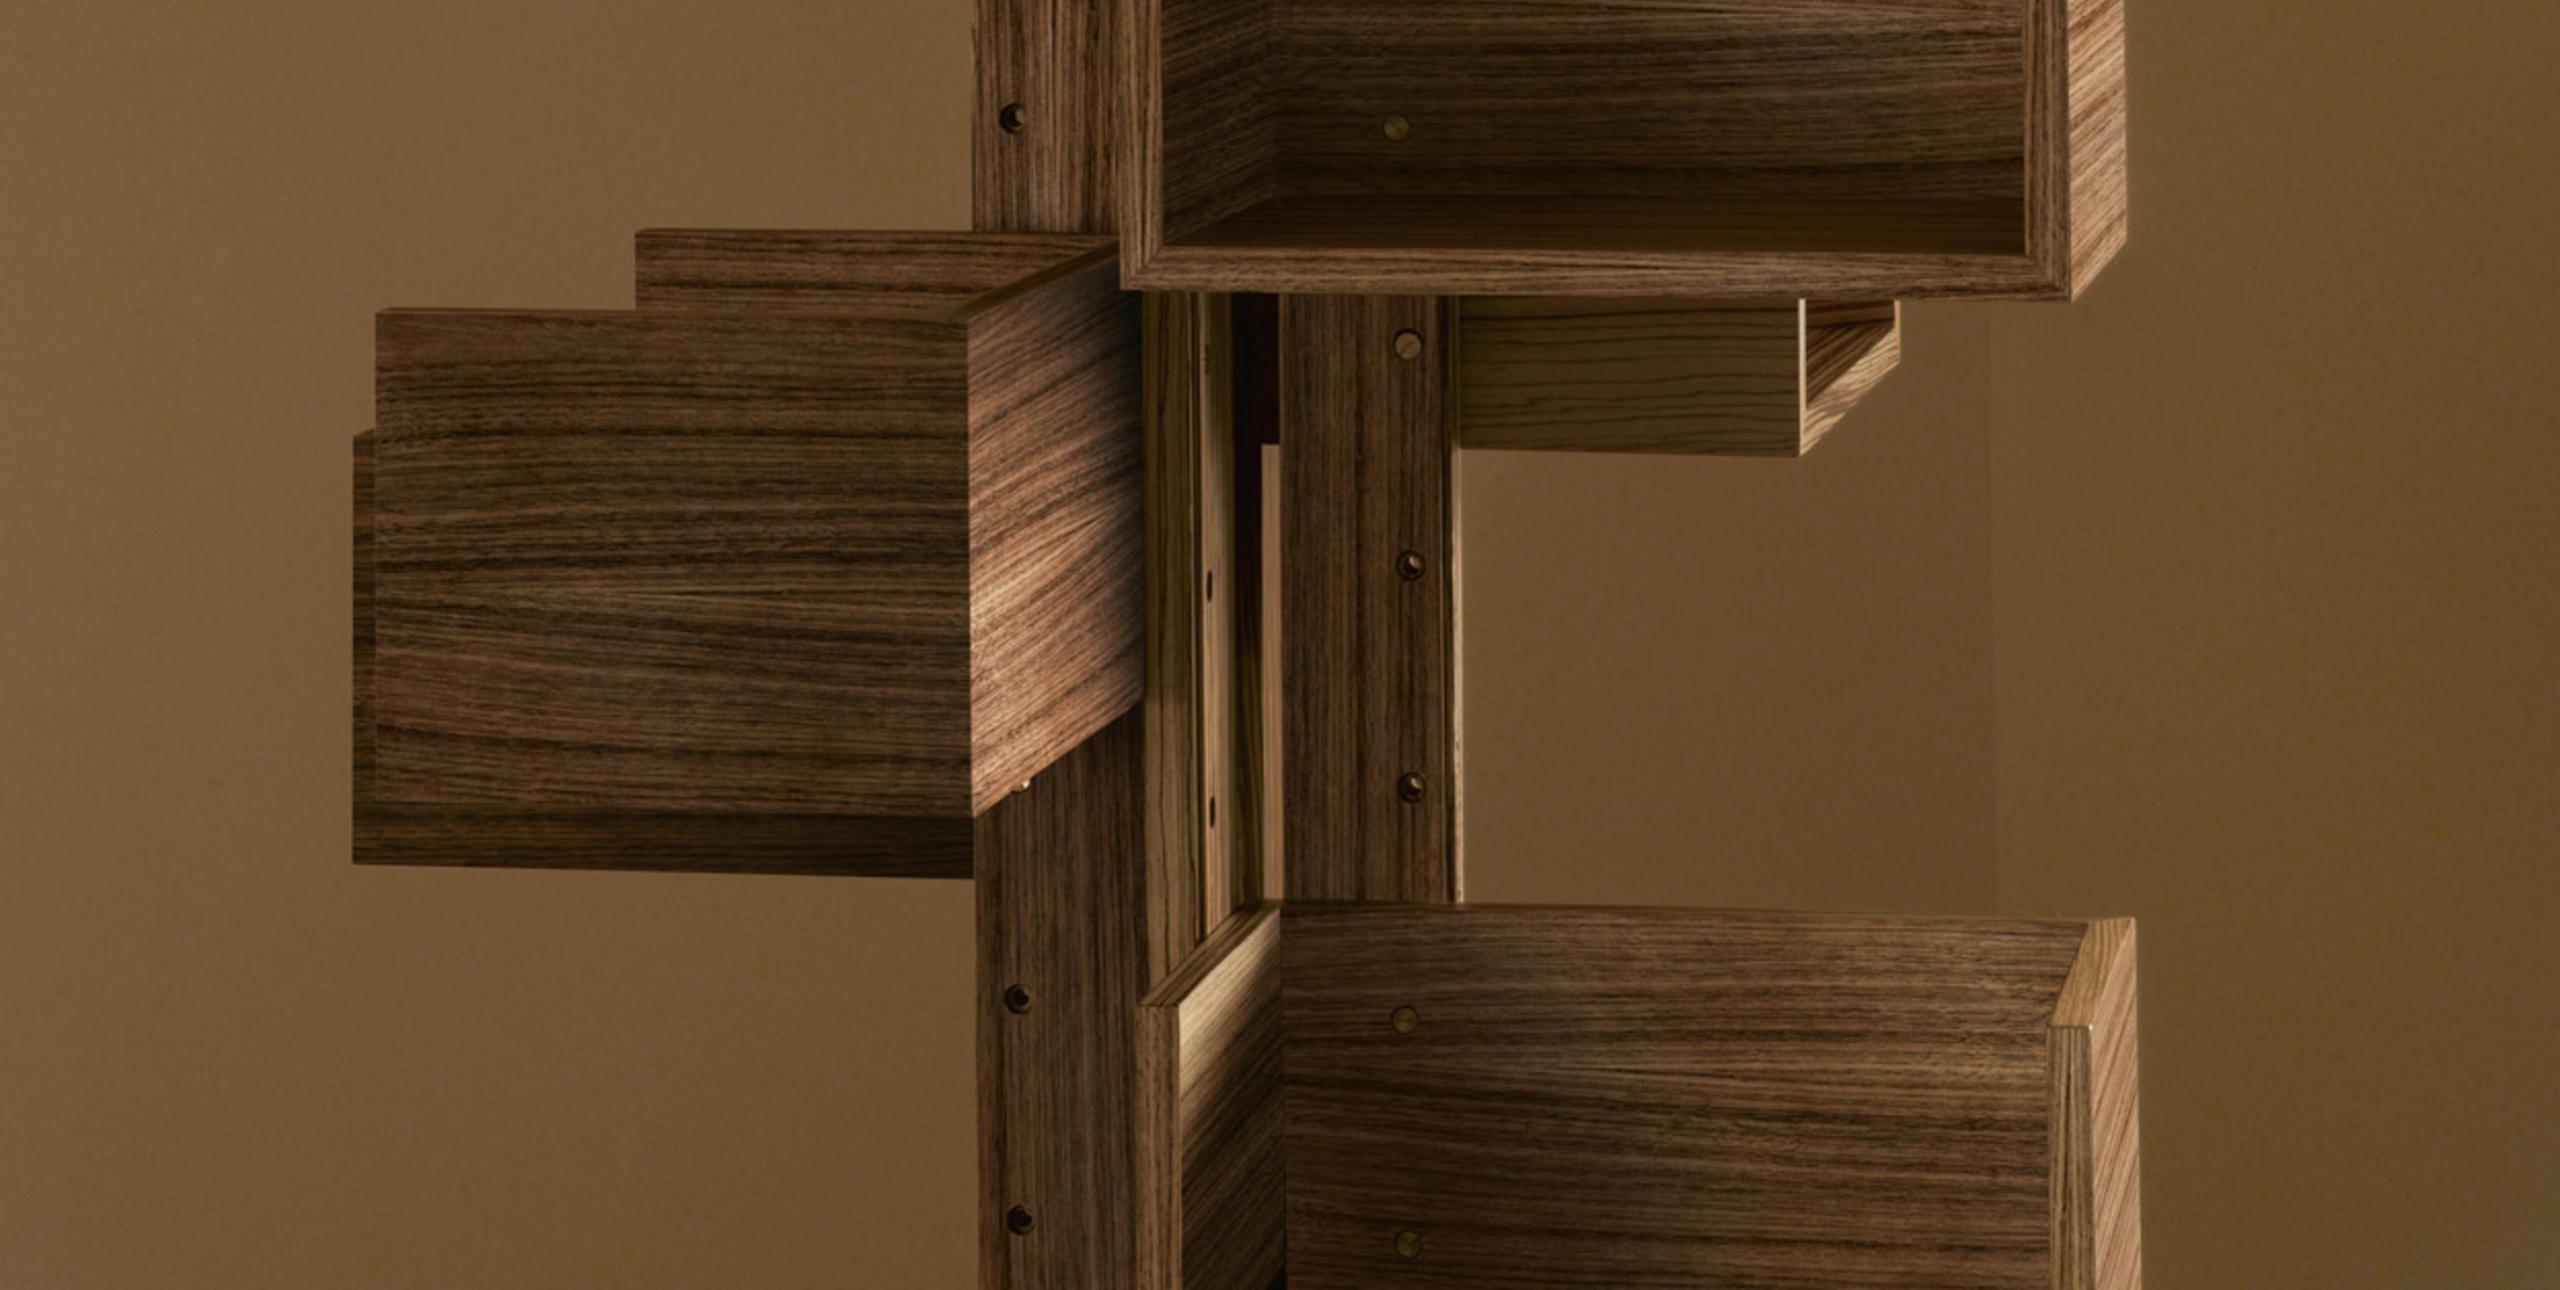 Albero Bookcase by Poltrona Frau